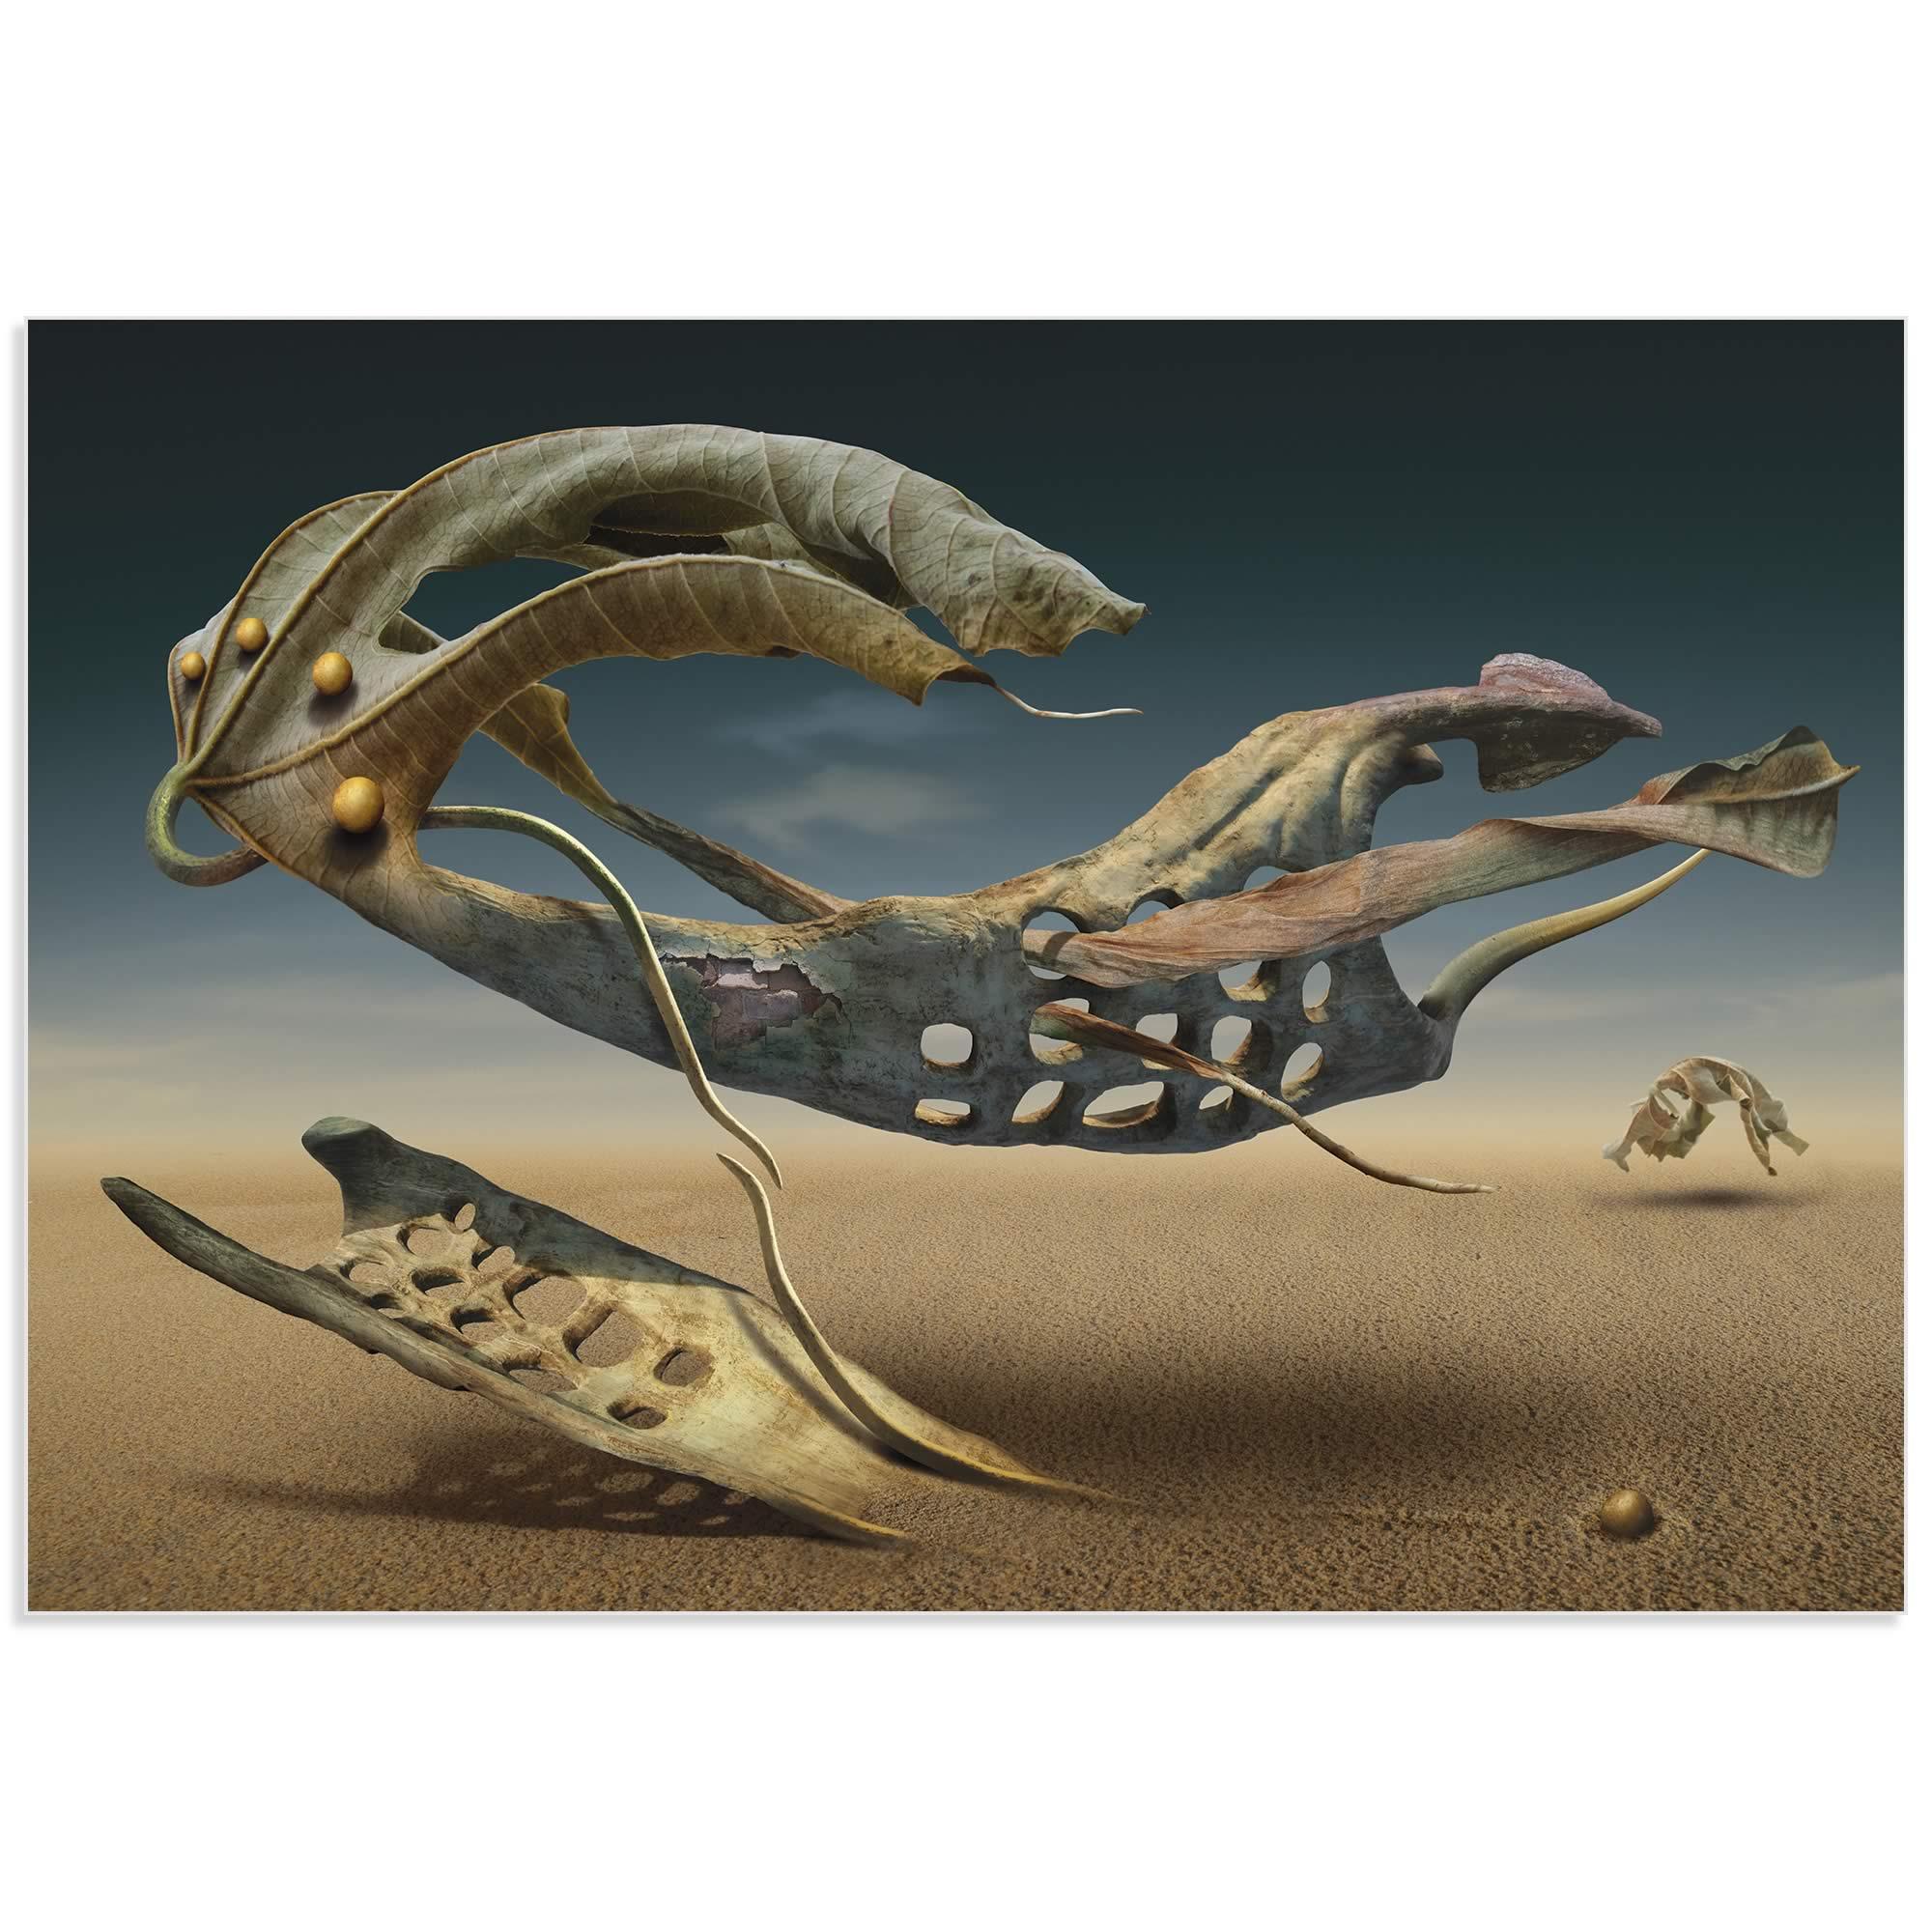 Surreal Desert by Radoslav Penchev - Surreal Landscape Art on Metal or Acrylic - Alternate View 2